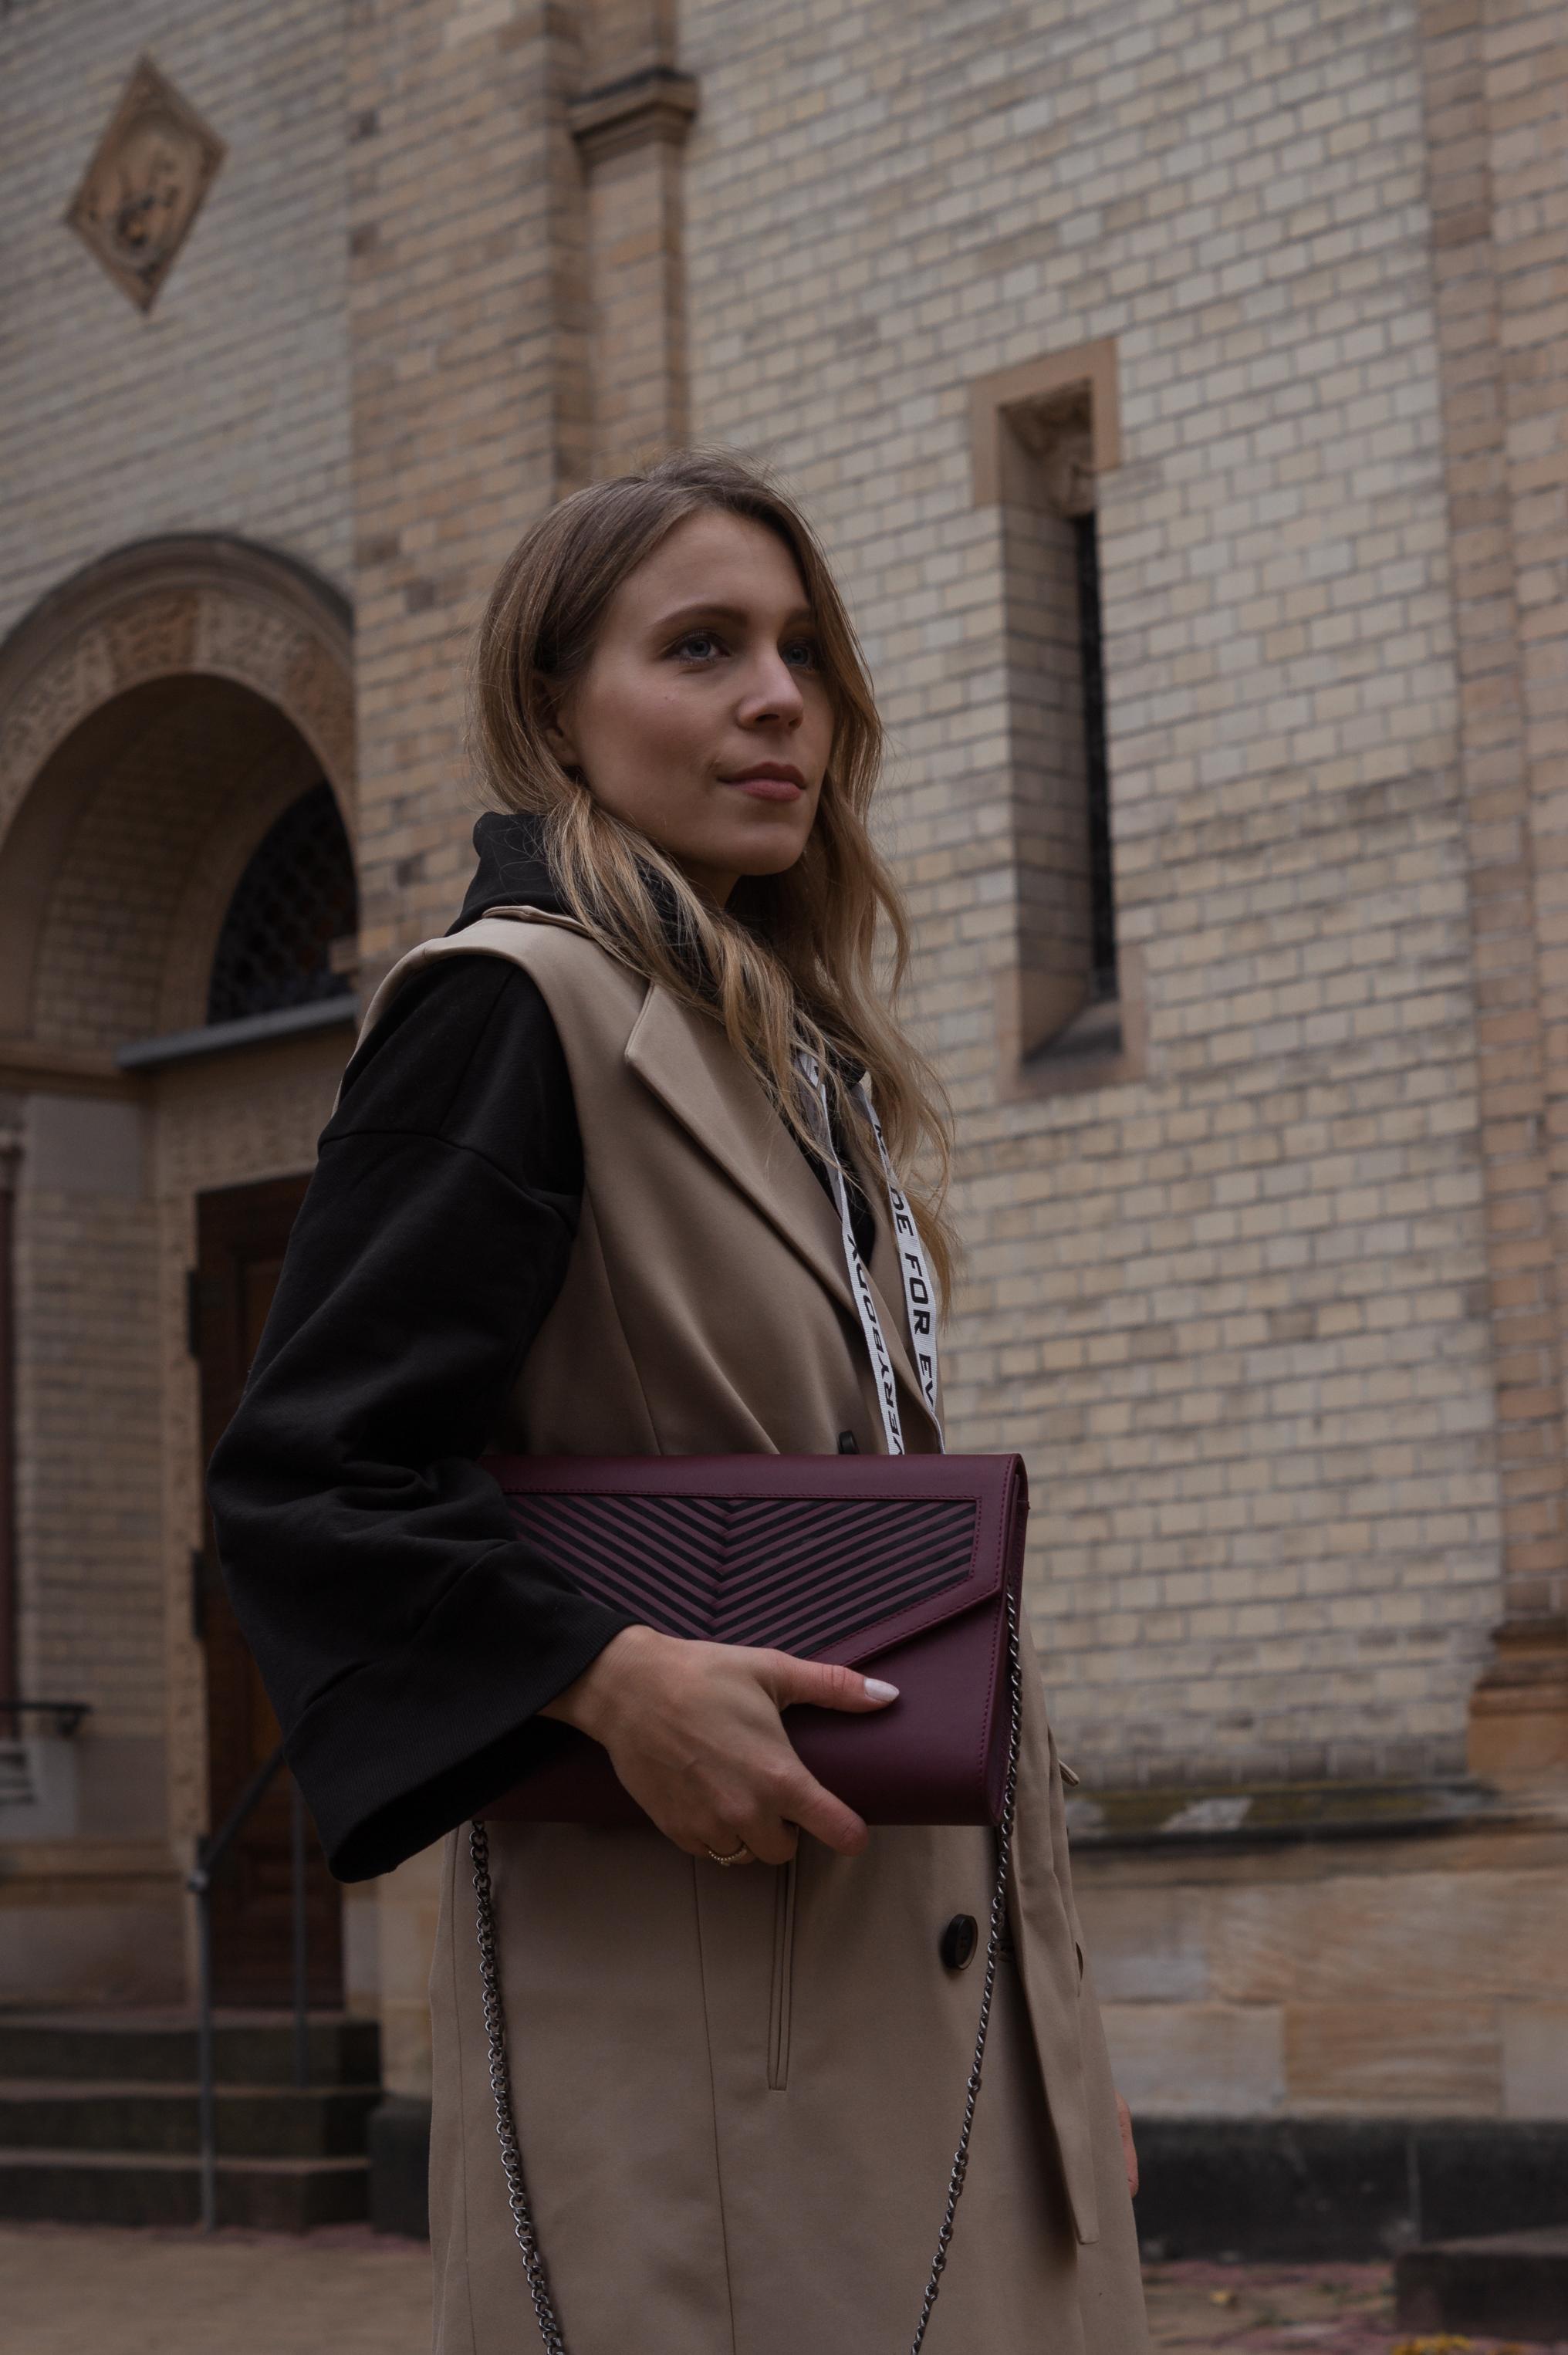 Zara Hoodie Trench Vest Lili Radu Bag Fashionblogger Sariety Modeblog Heidelberg Fall Layers karierte Hose Mango Streetstyle_17